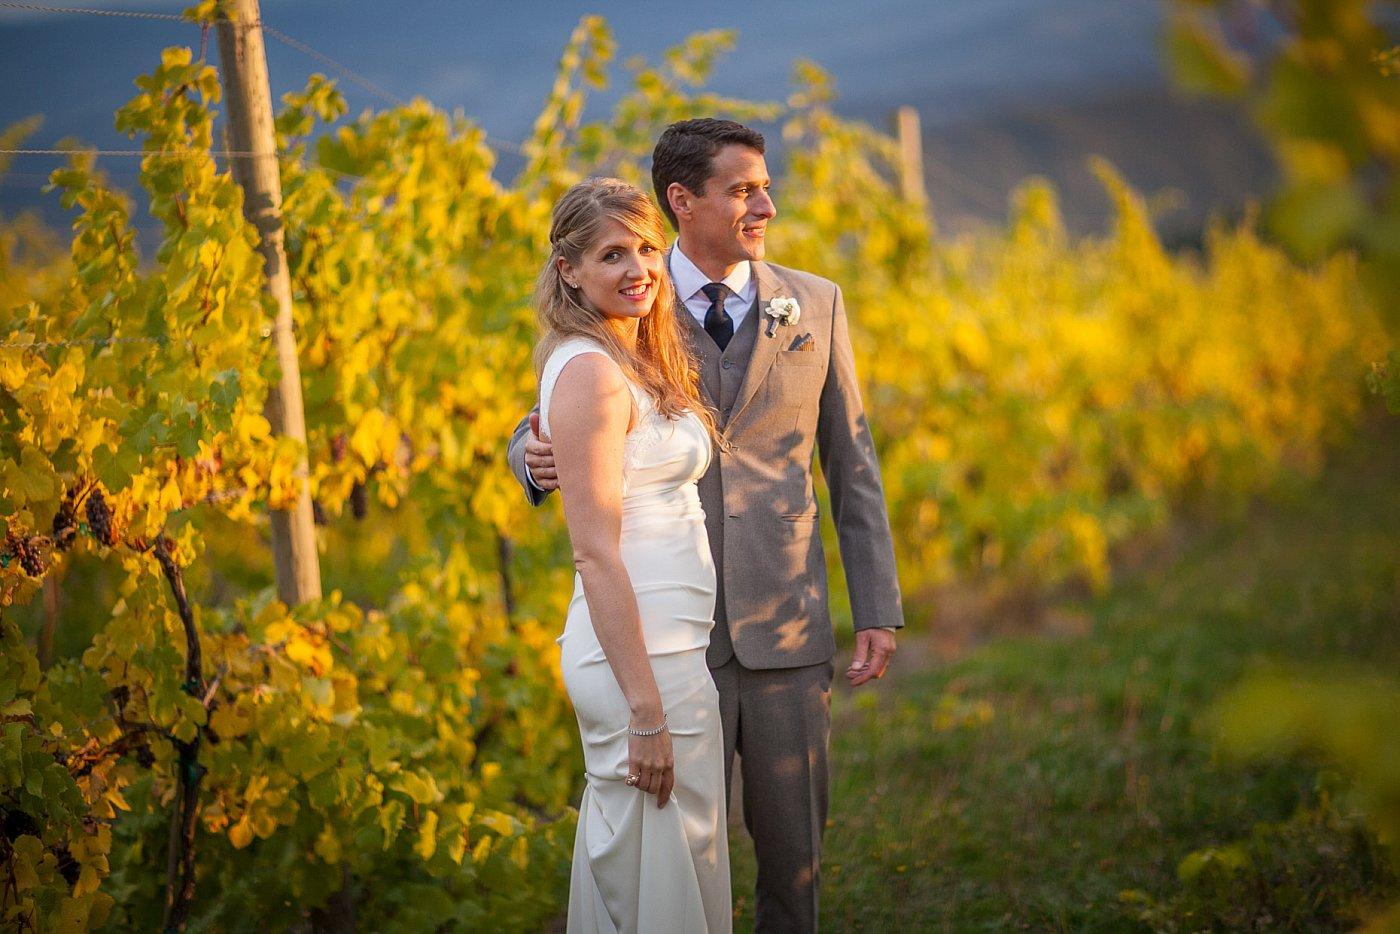 Wedding Day Photography Worksheet